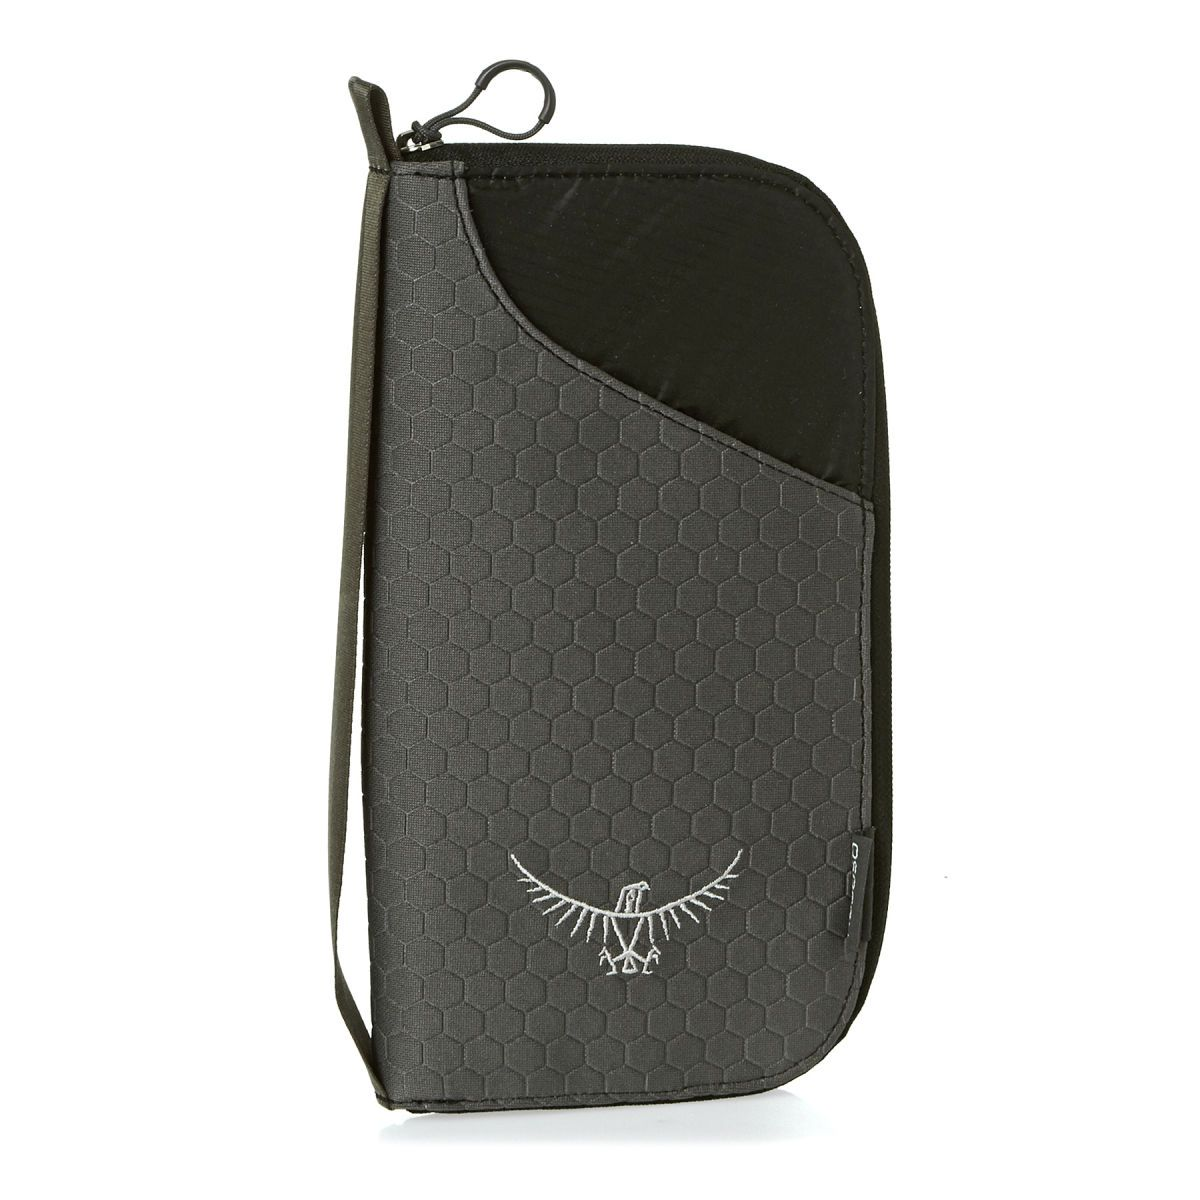 Osprey Document Zip Wallet | Travel accessories